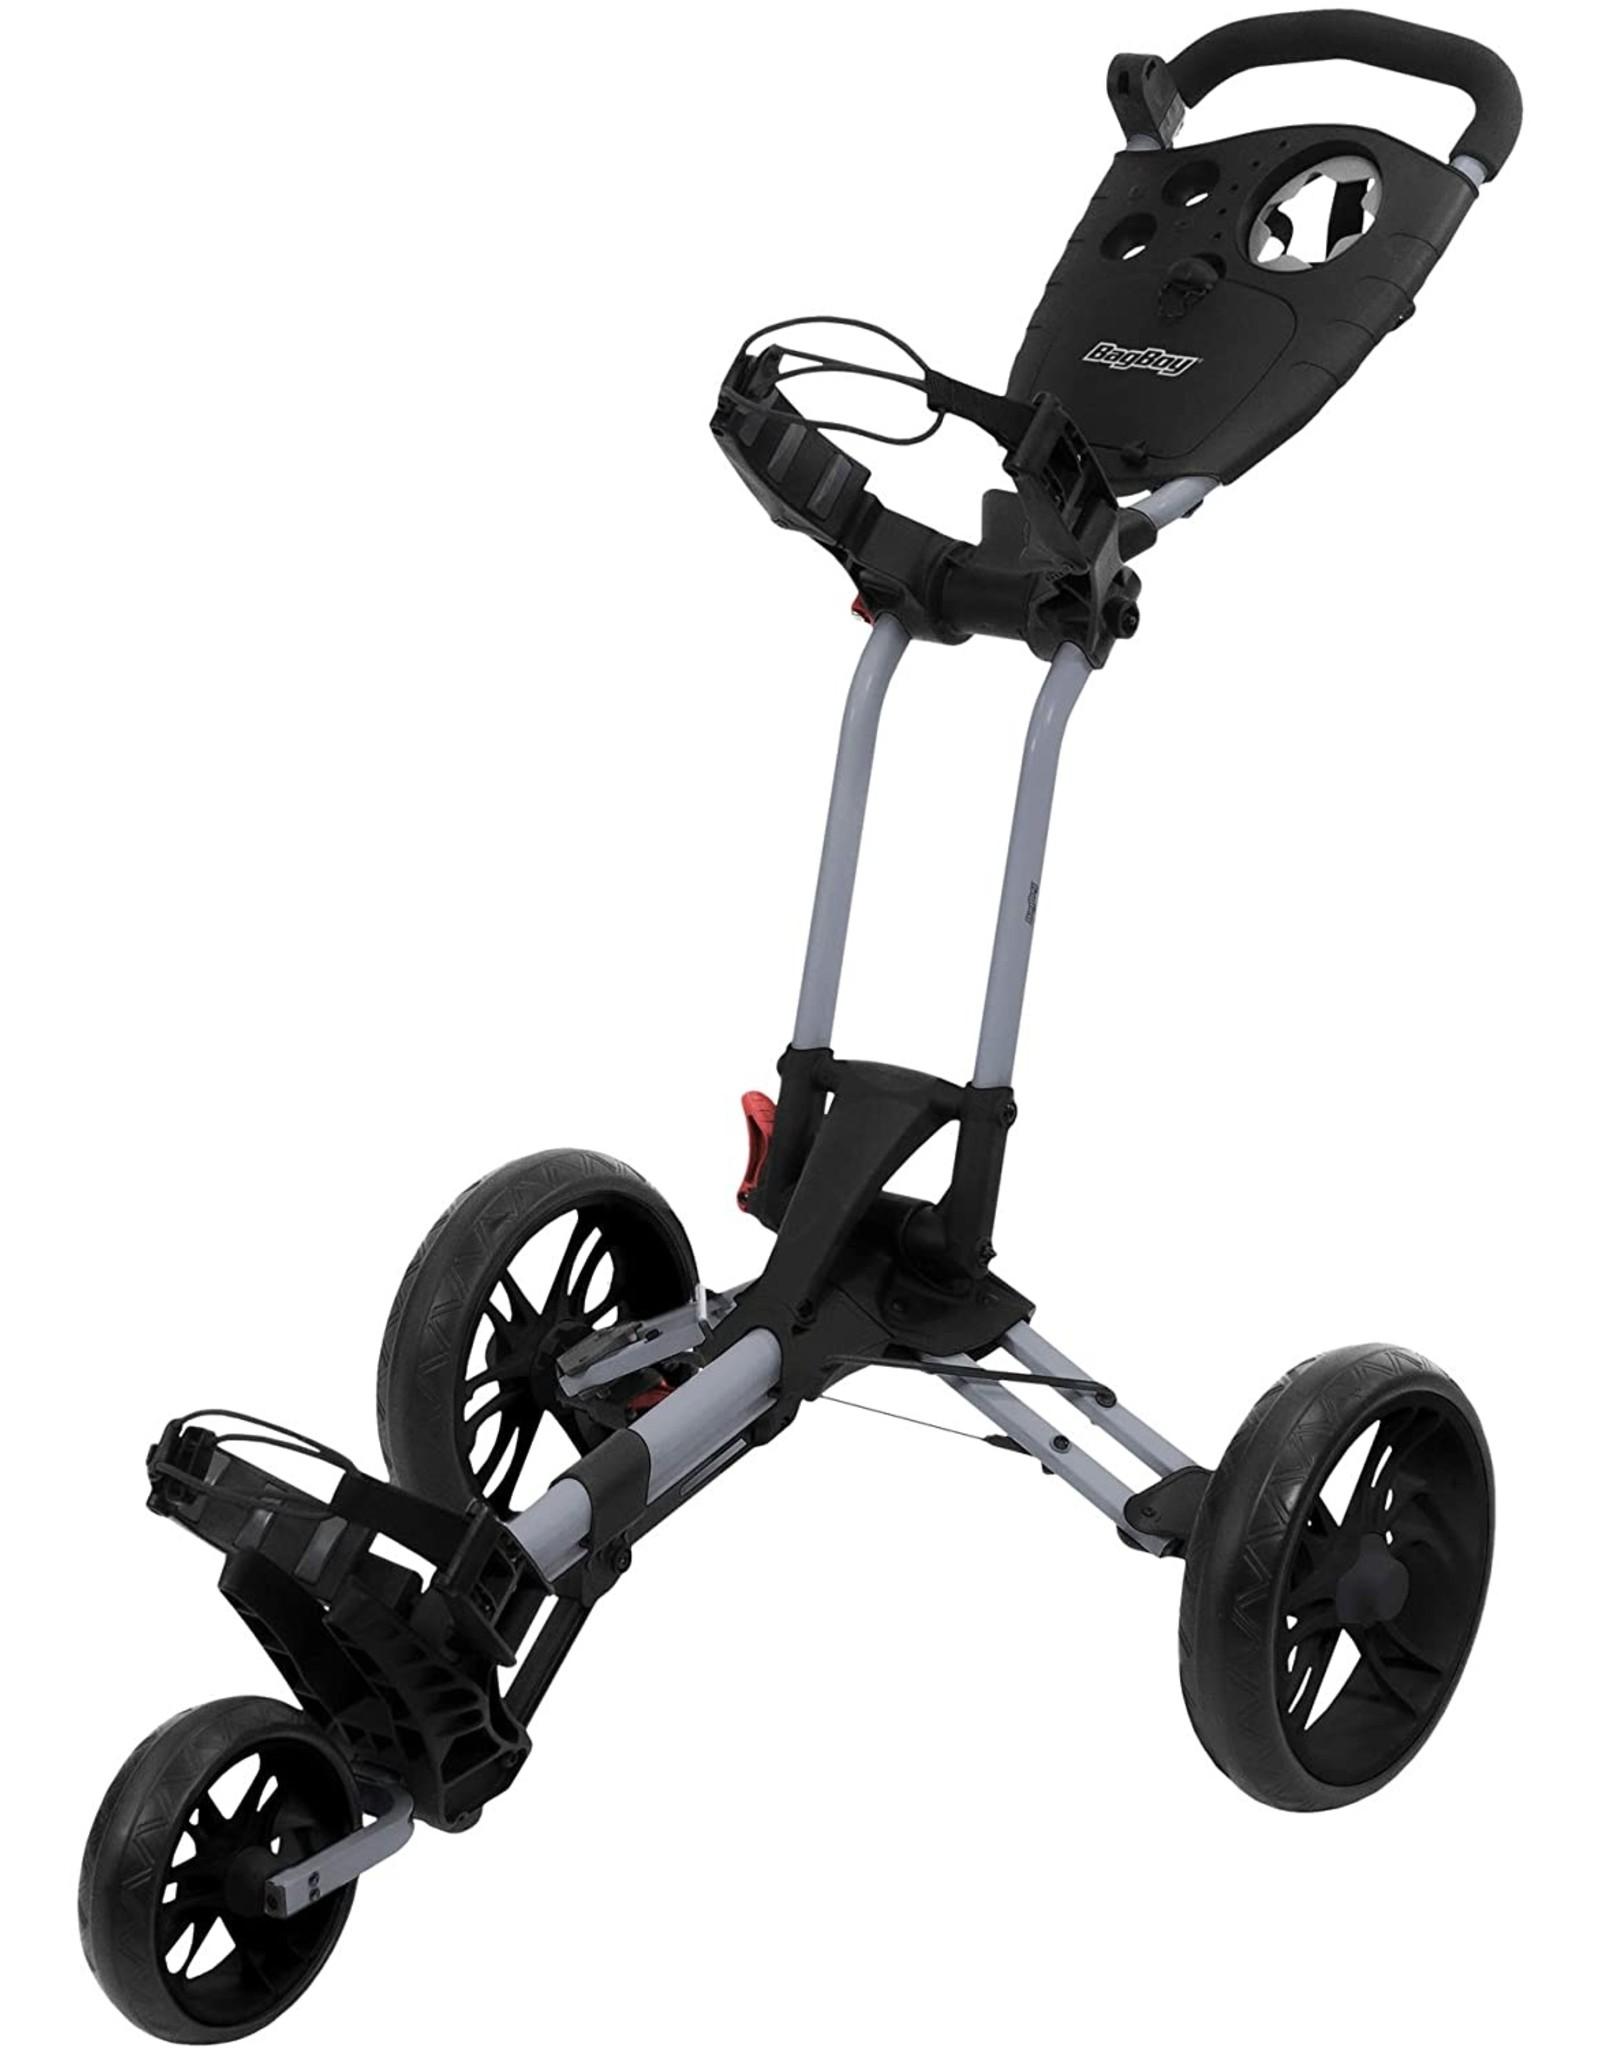 Bag Boy Bag Boy Spartan Push Cart